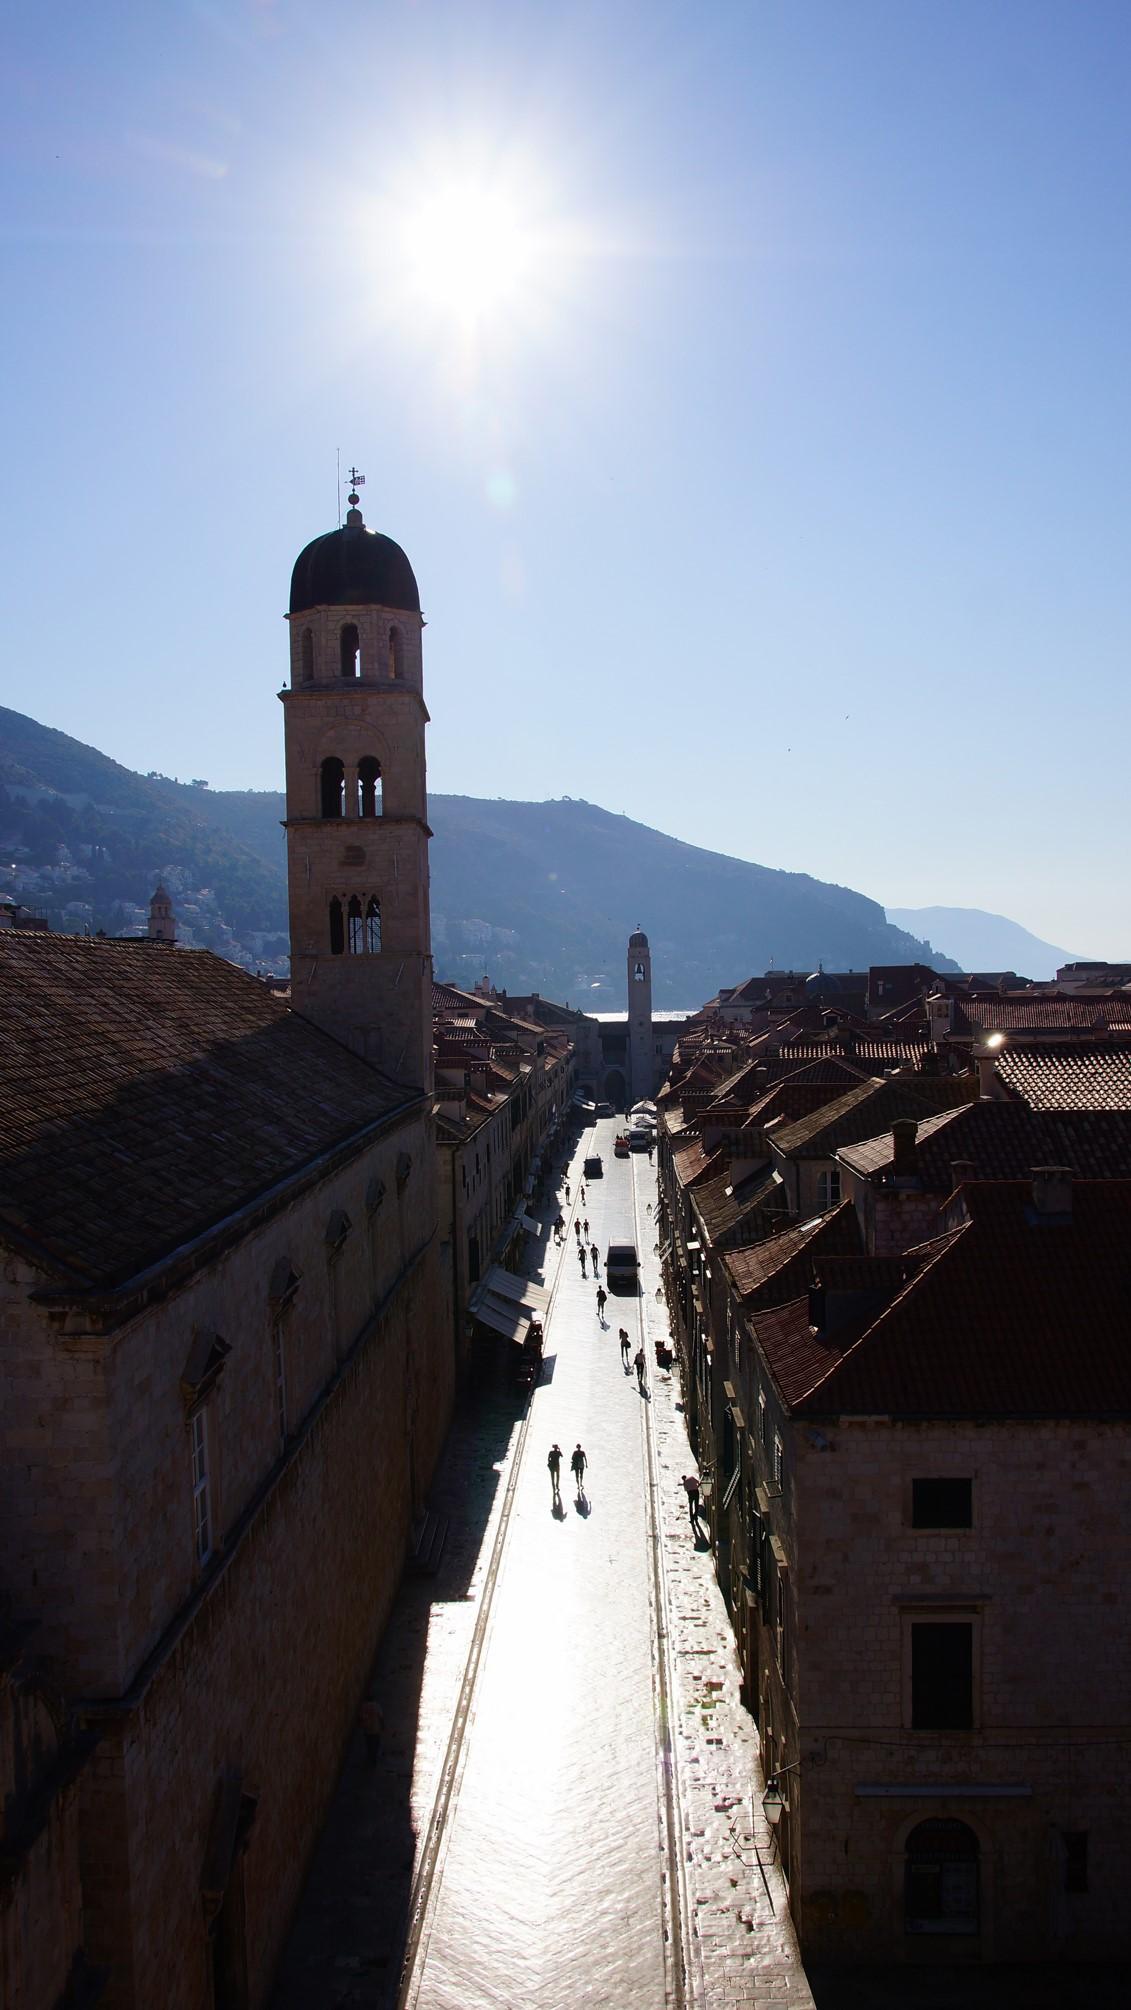 Stradun z murów, Duborvnik, Chorwacja